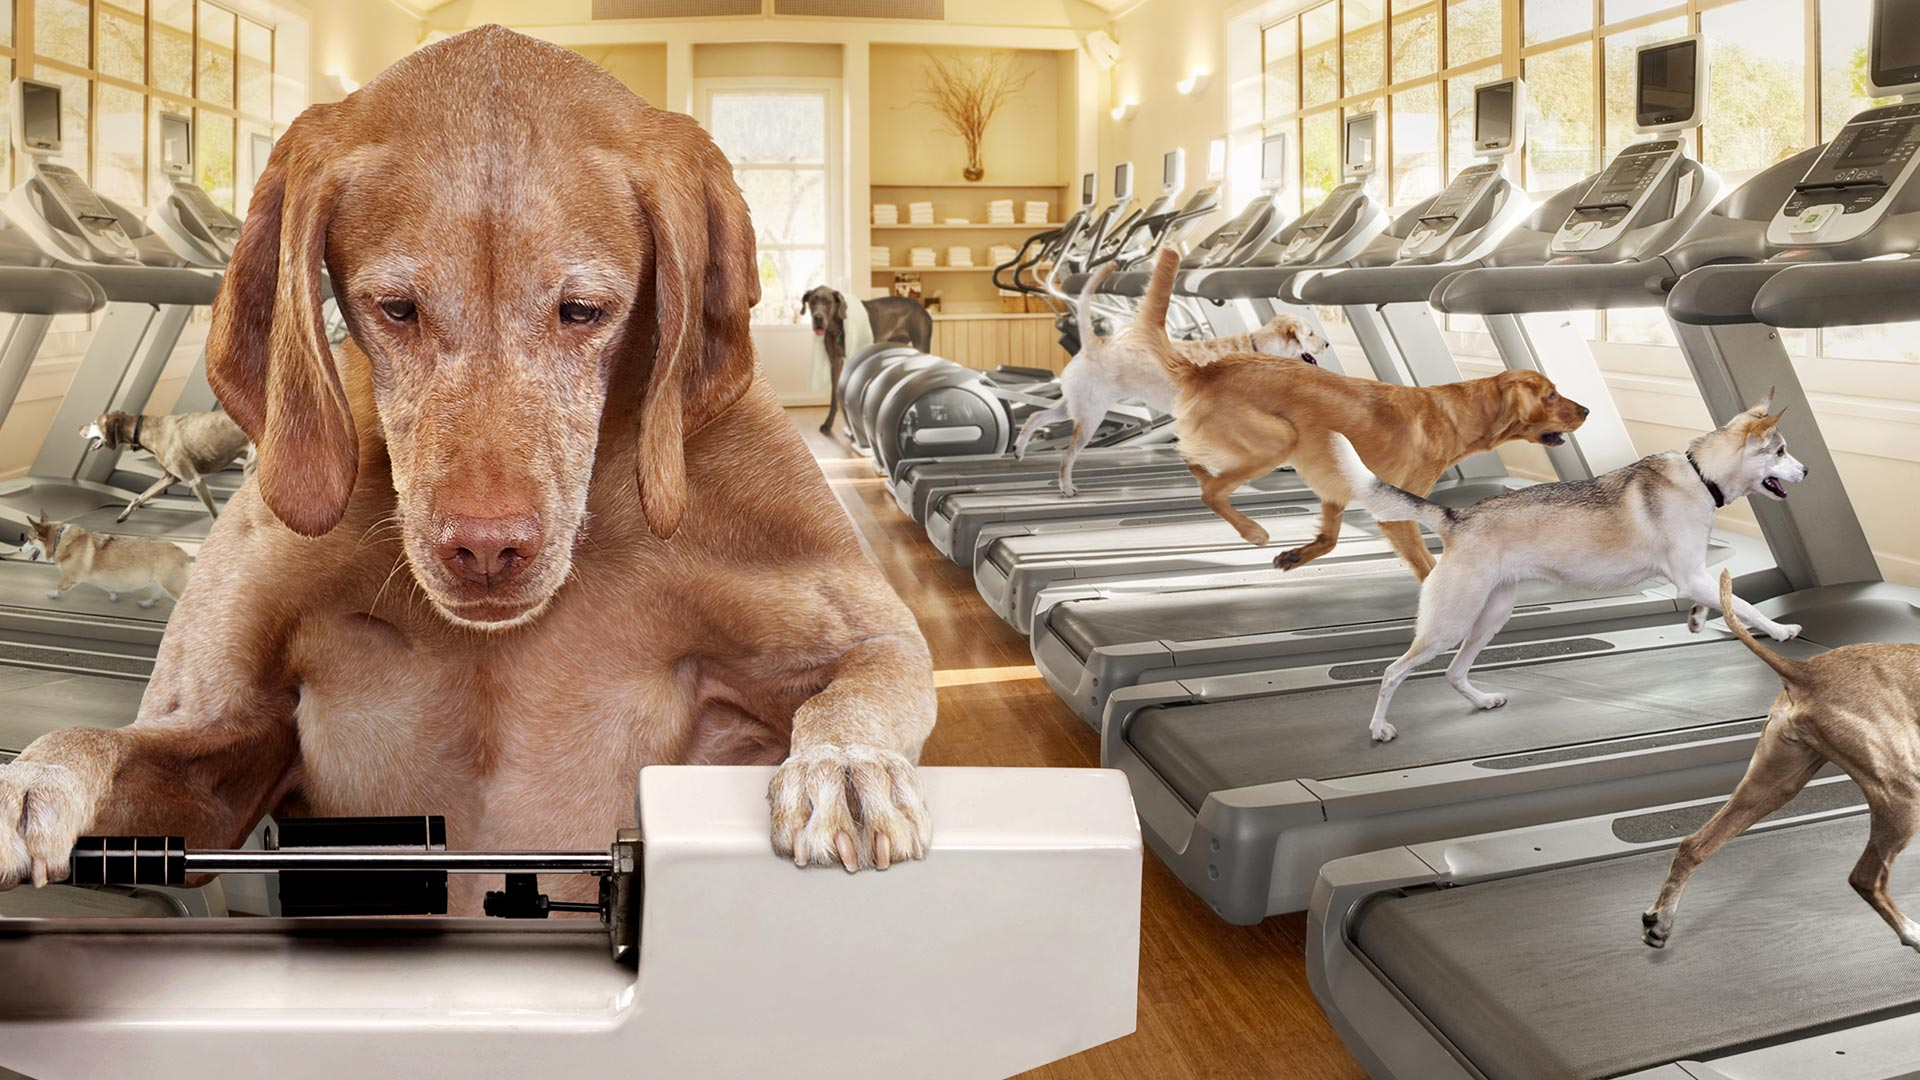 gold-dog-dry-weight-management-alt